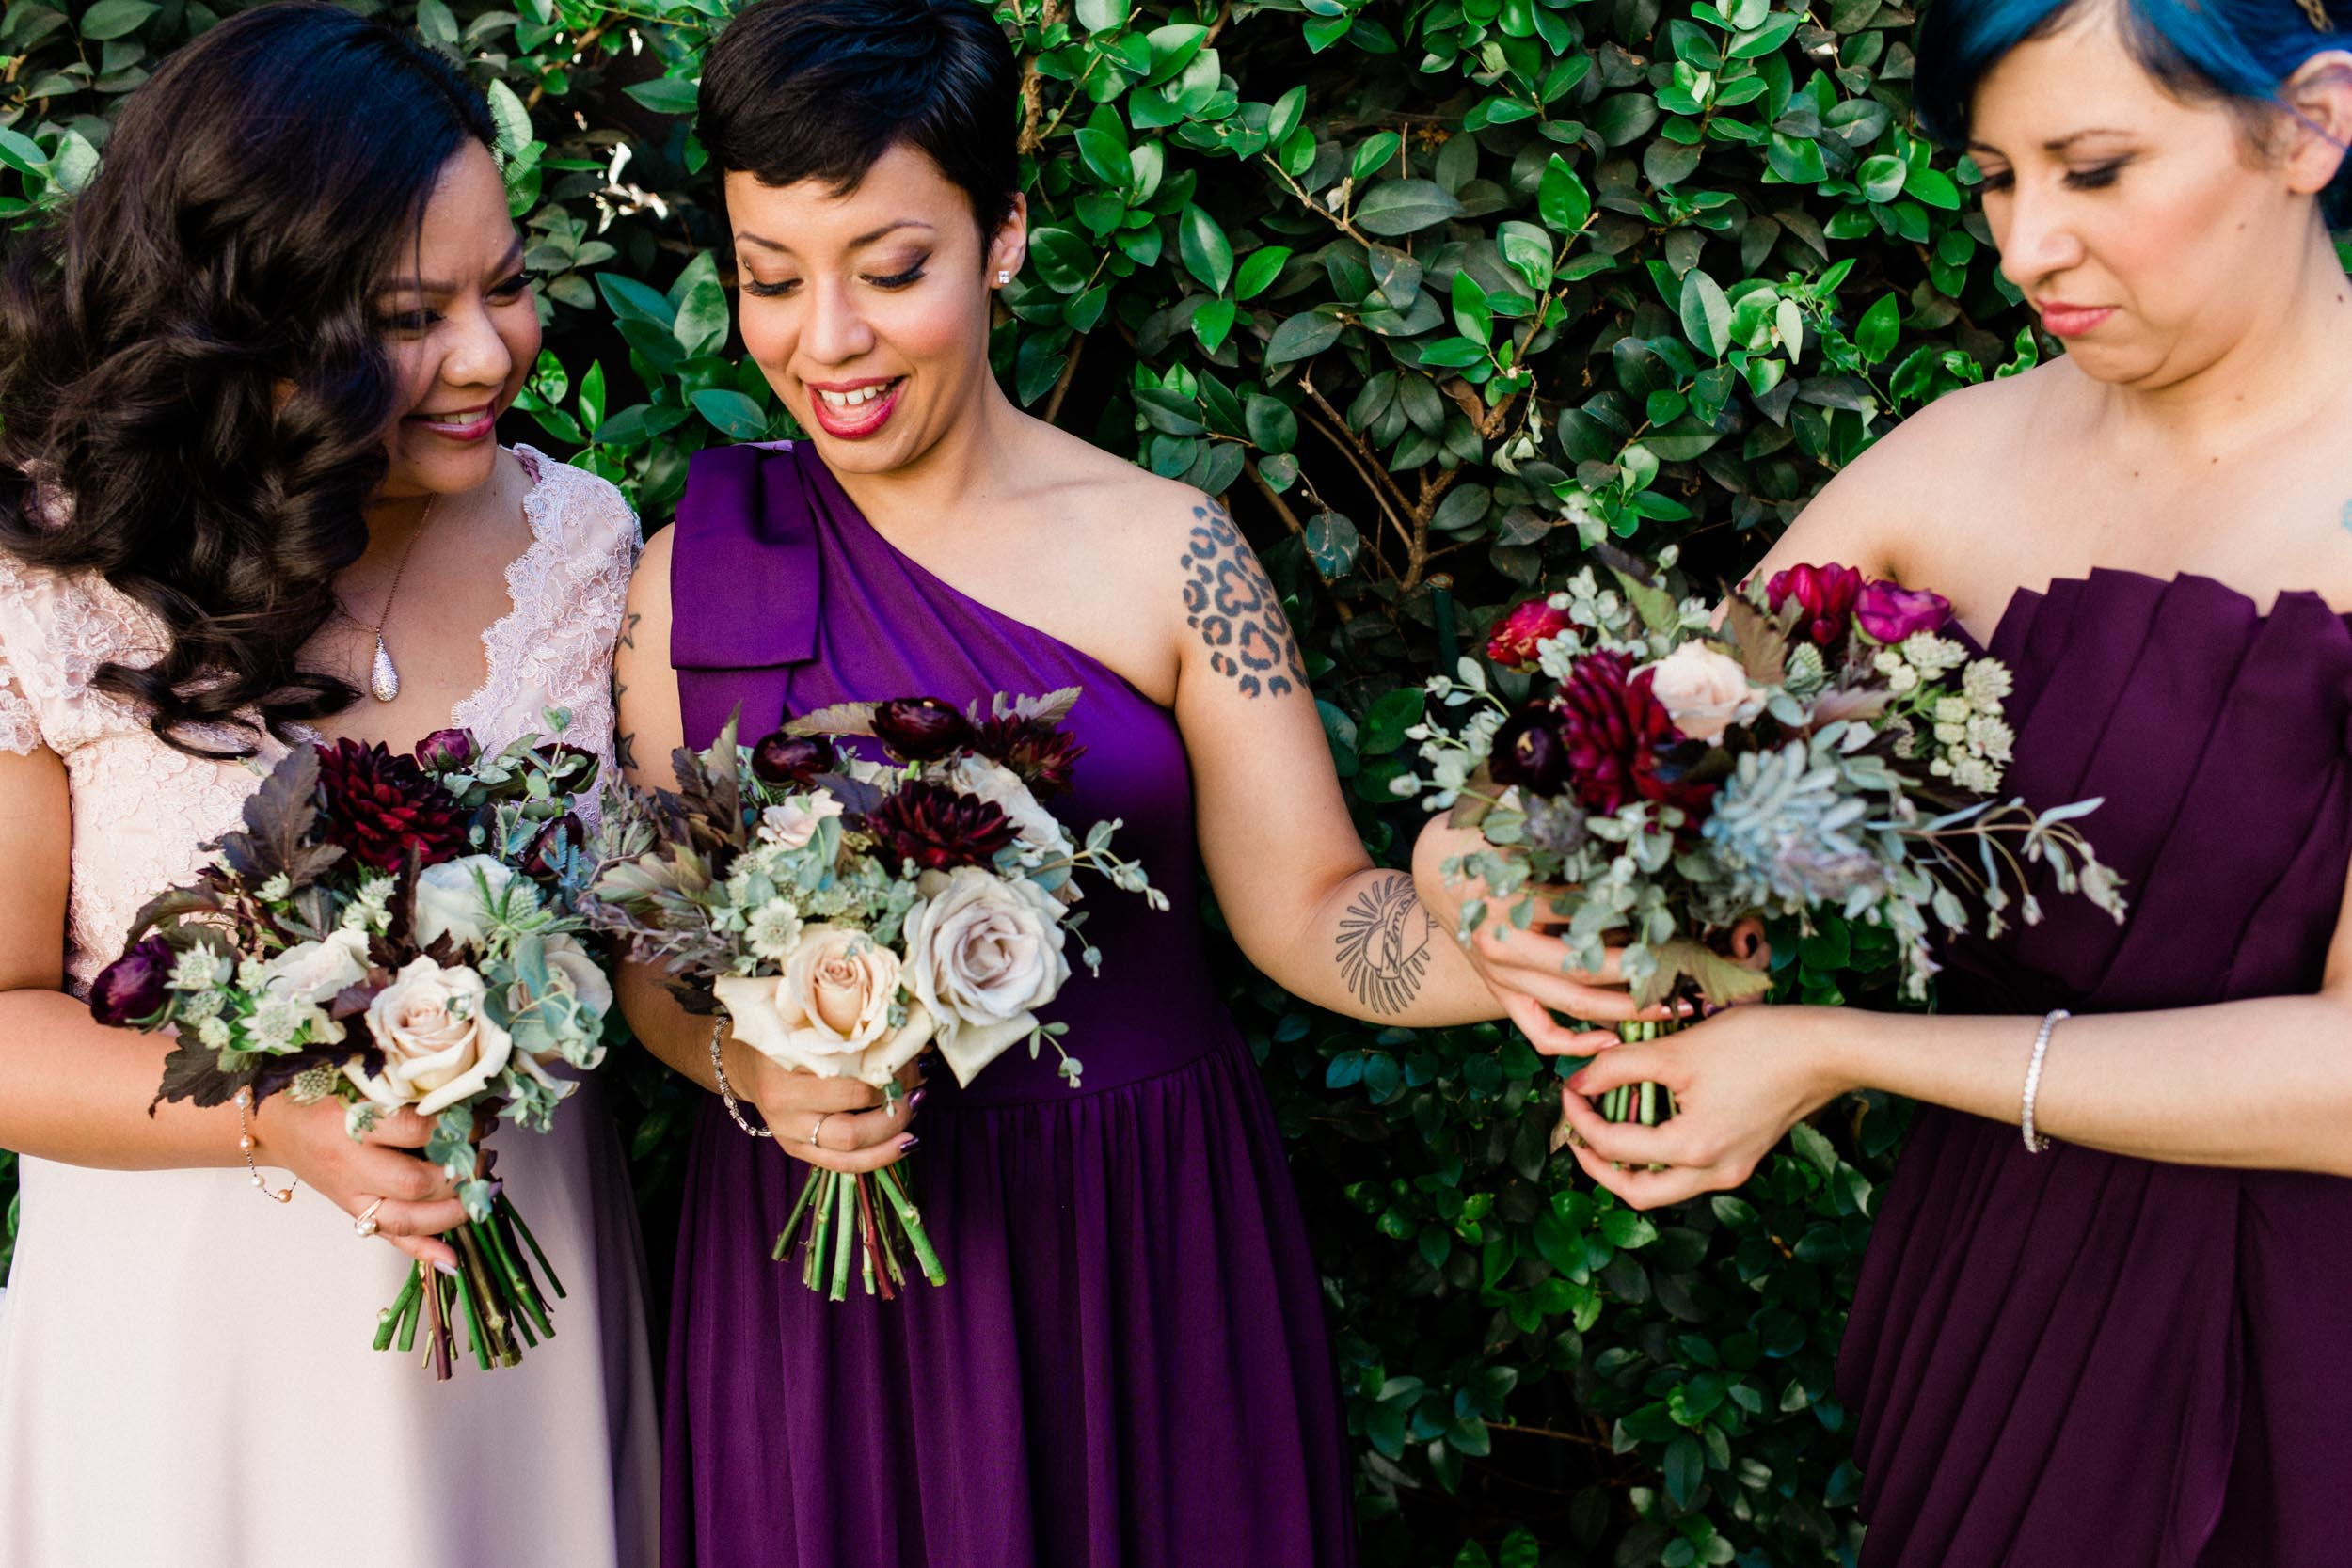 BKM-Photography-Los-Angeles-Highland-Park-York-Manor-Wedding-Photography-0501.jpg